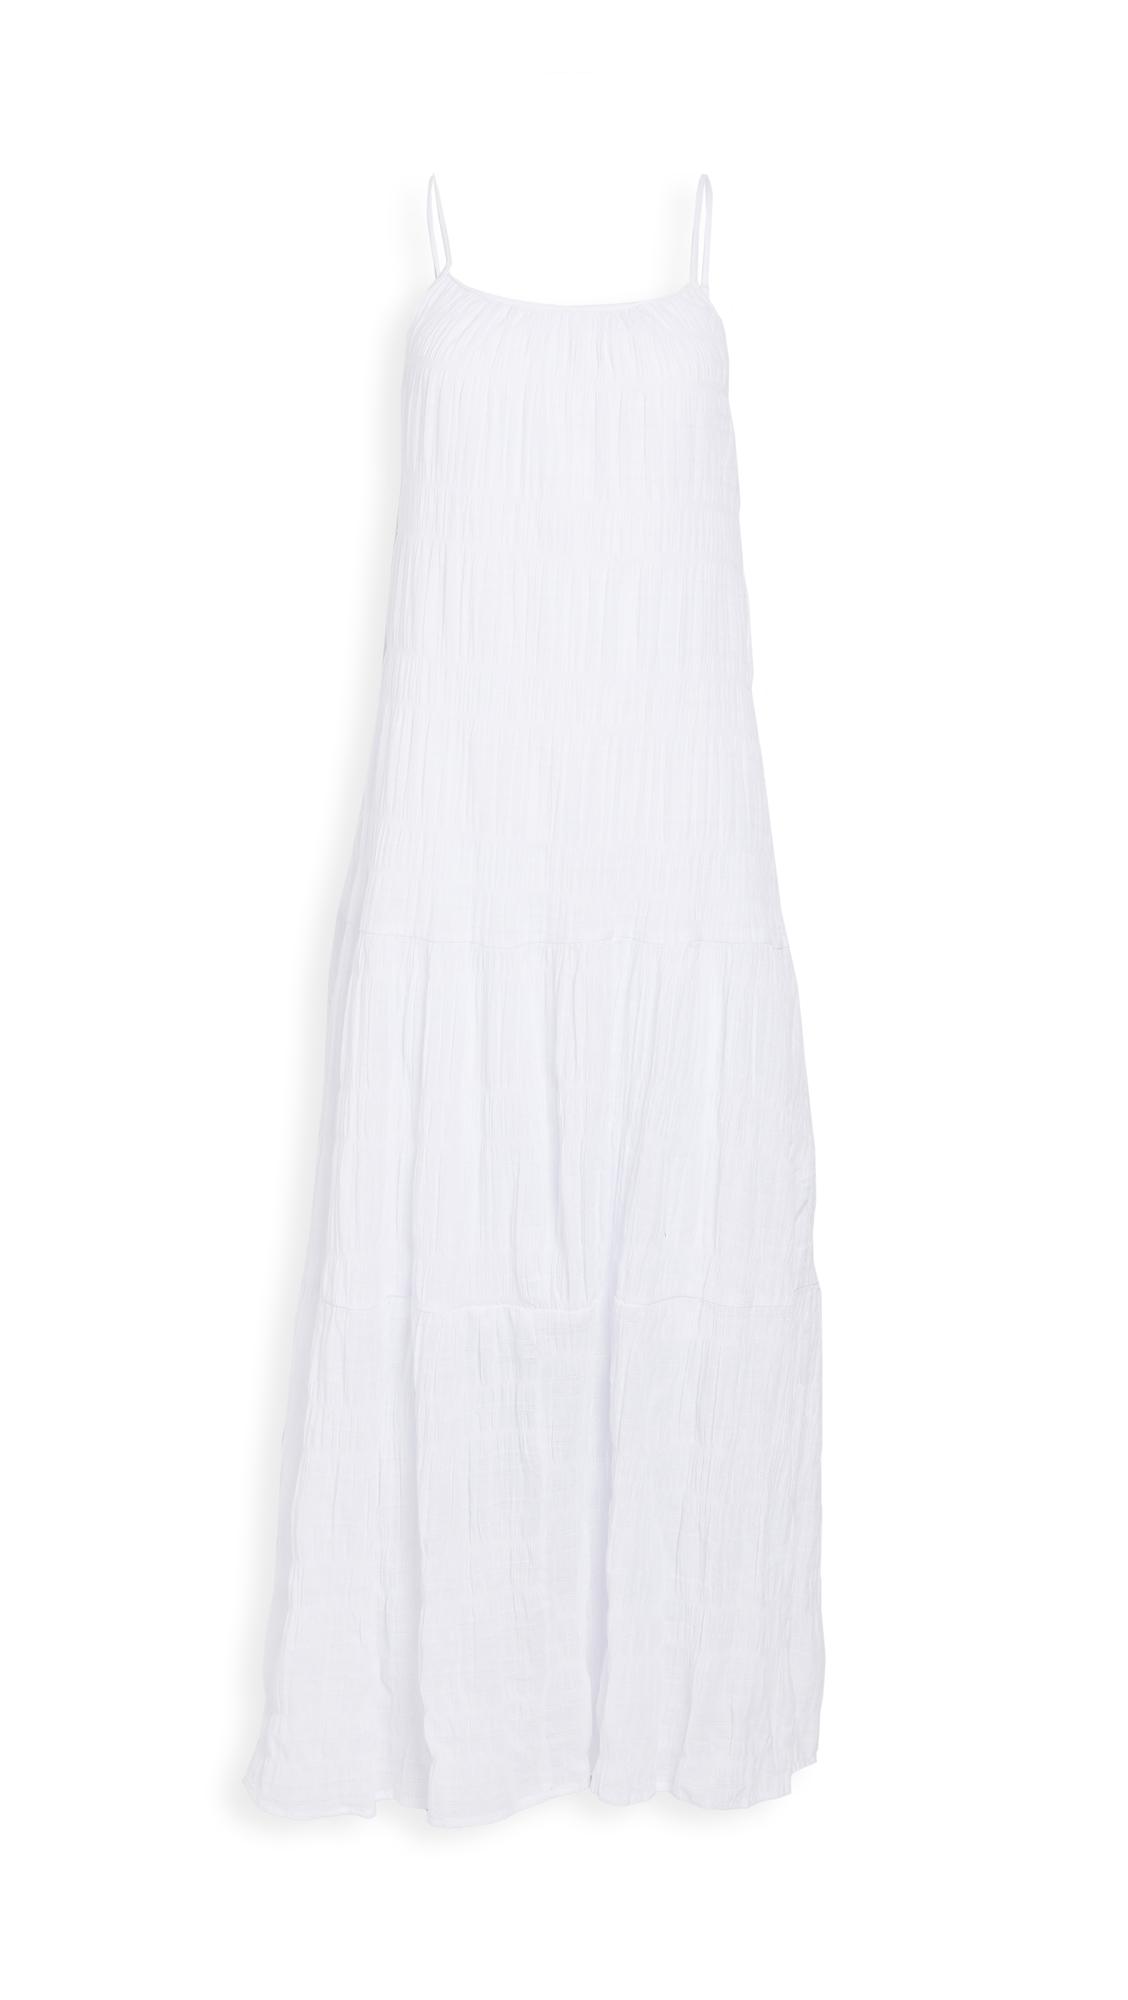 BB Dakota Roman Holiday Dress